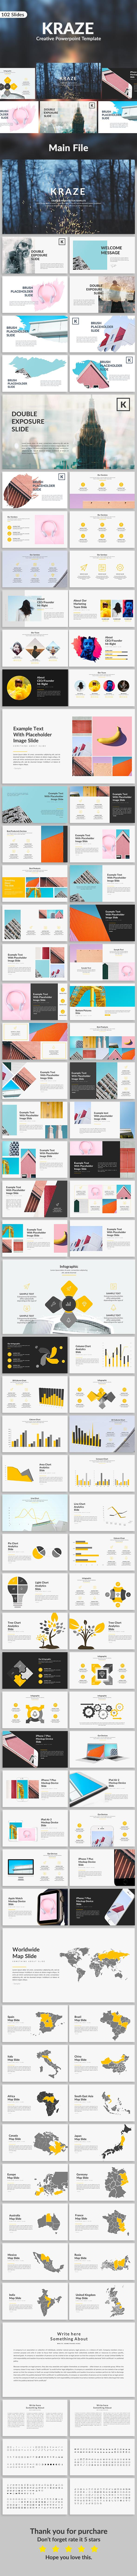 Kraze - Creative Powerpoint Template - Creative PowerPoint Templates